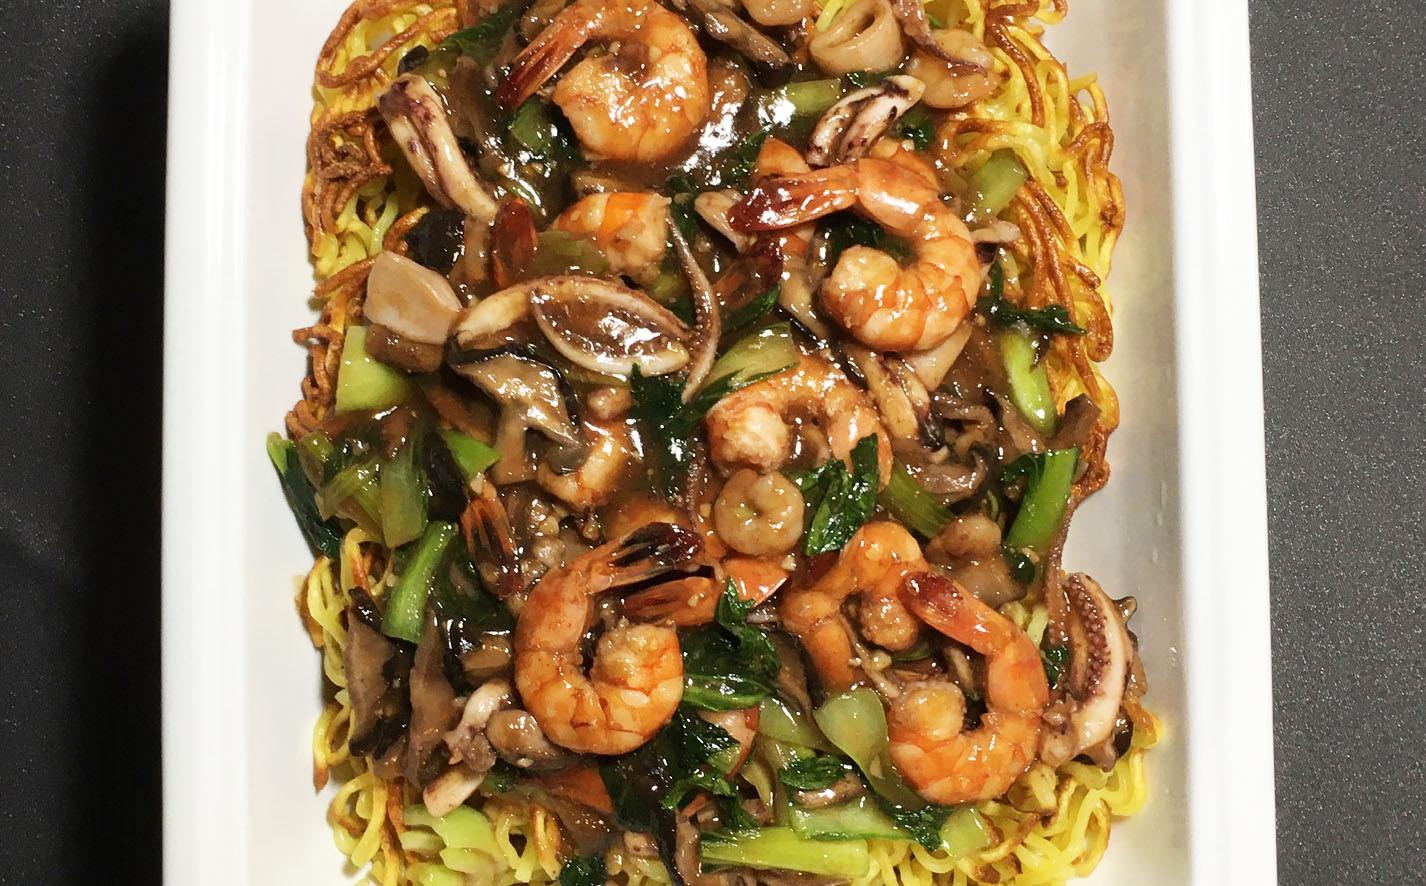 Hong Kong style crispy chow mein